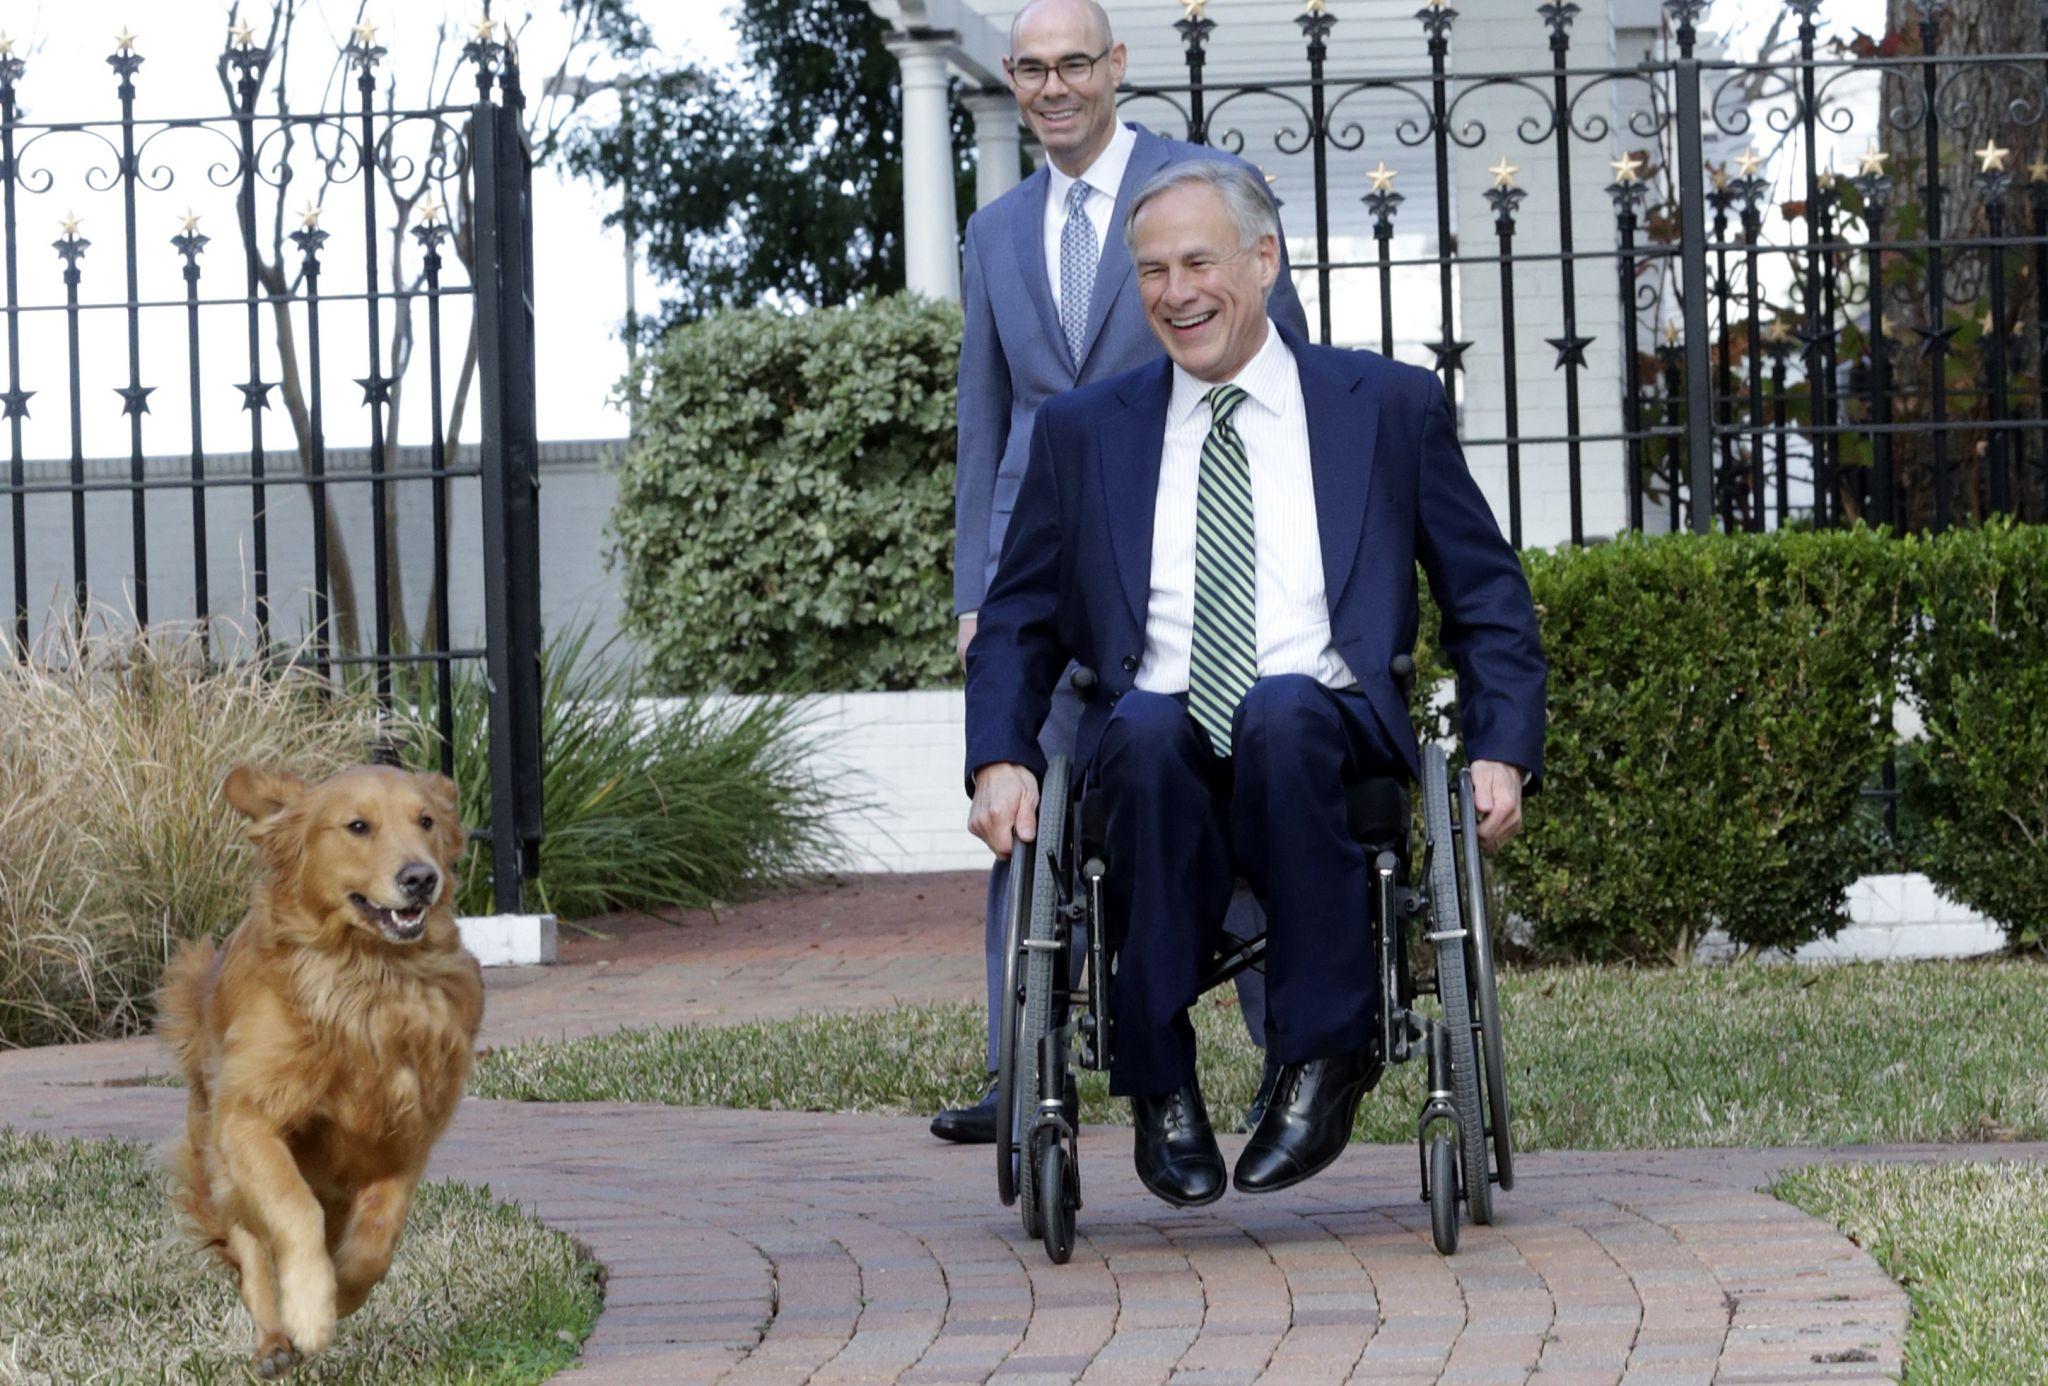 Abbott vetoes bipartisan anti dog-chain bill. Twitter responds with #AbbottHatesDogs.